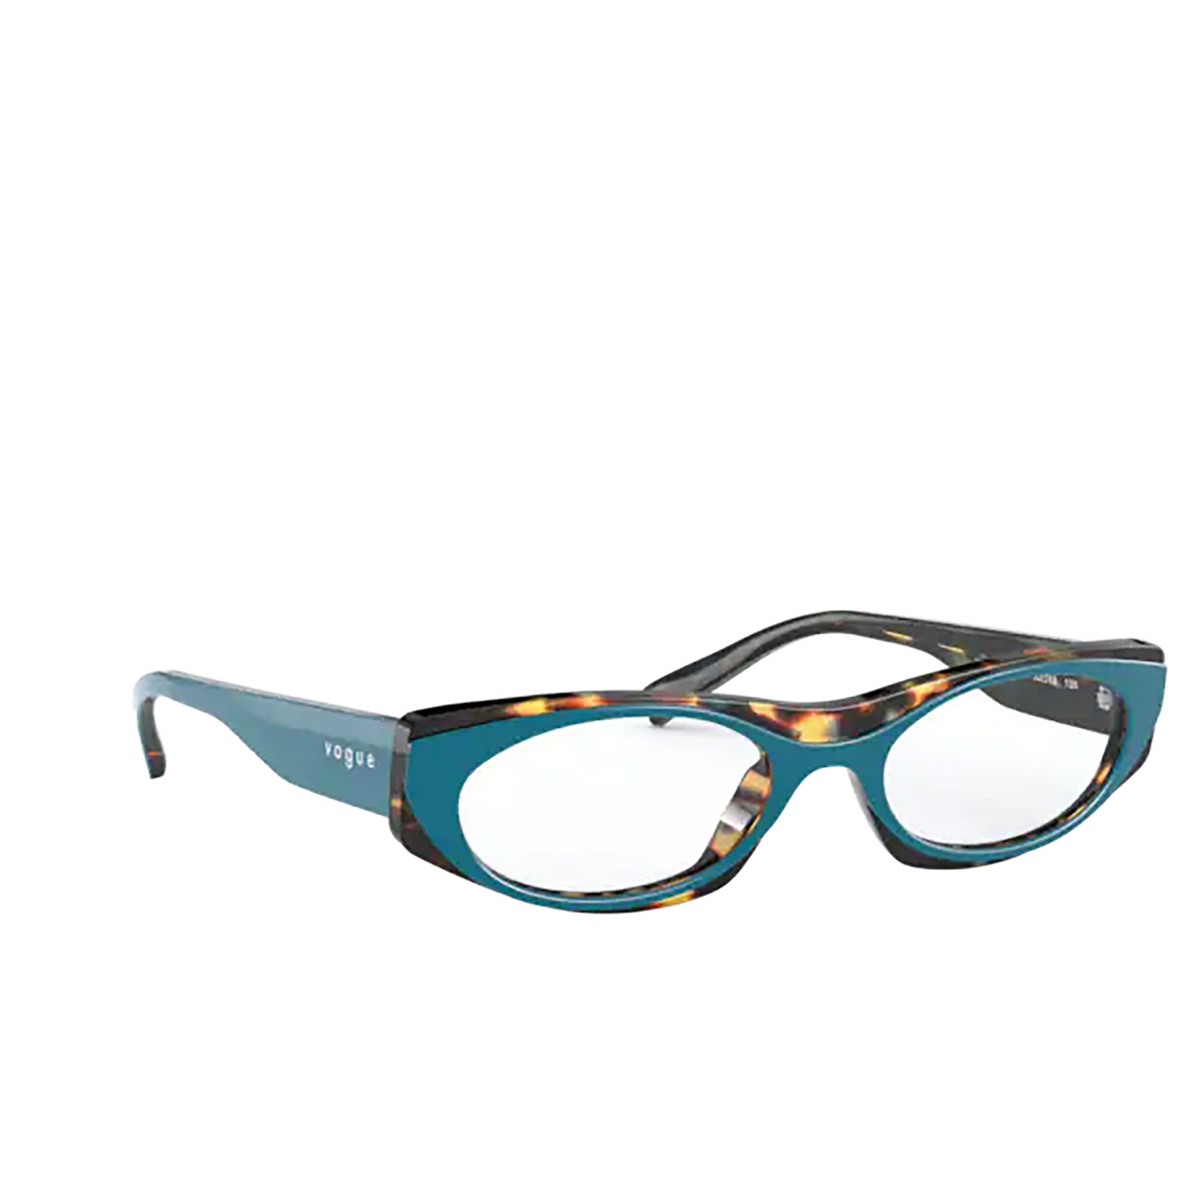 Vogue® Oval Eyeglasses: VO5316 color Top Green / Multi Blue Havana 2816 - three-quarters view.